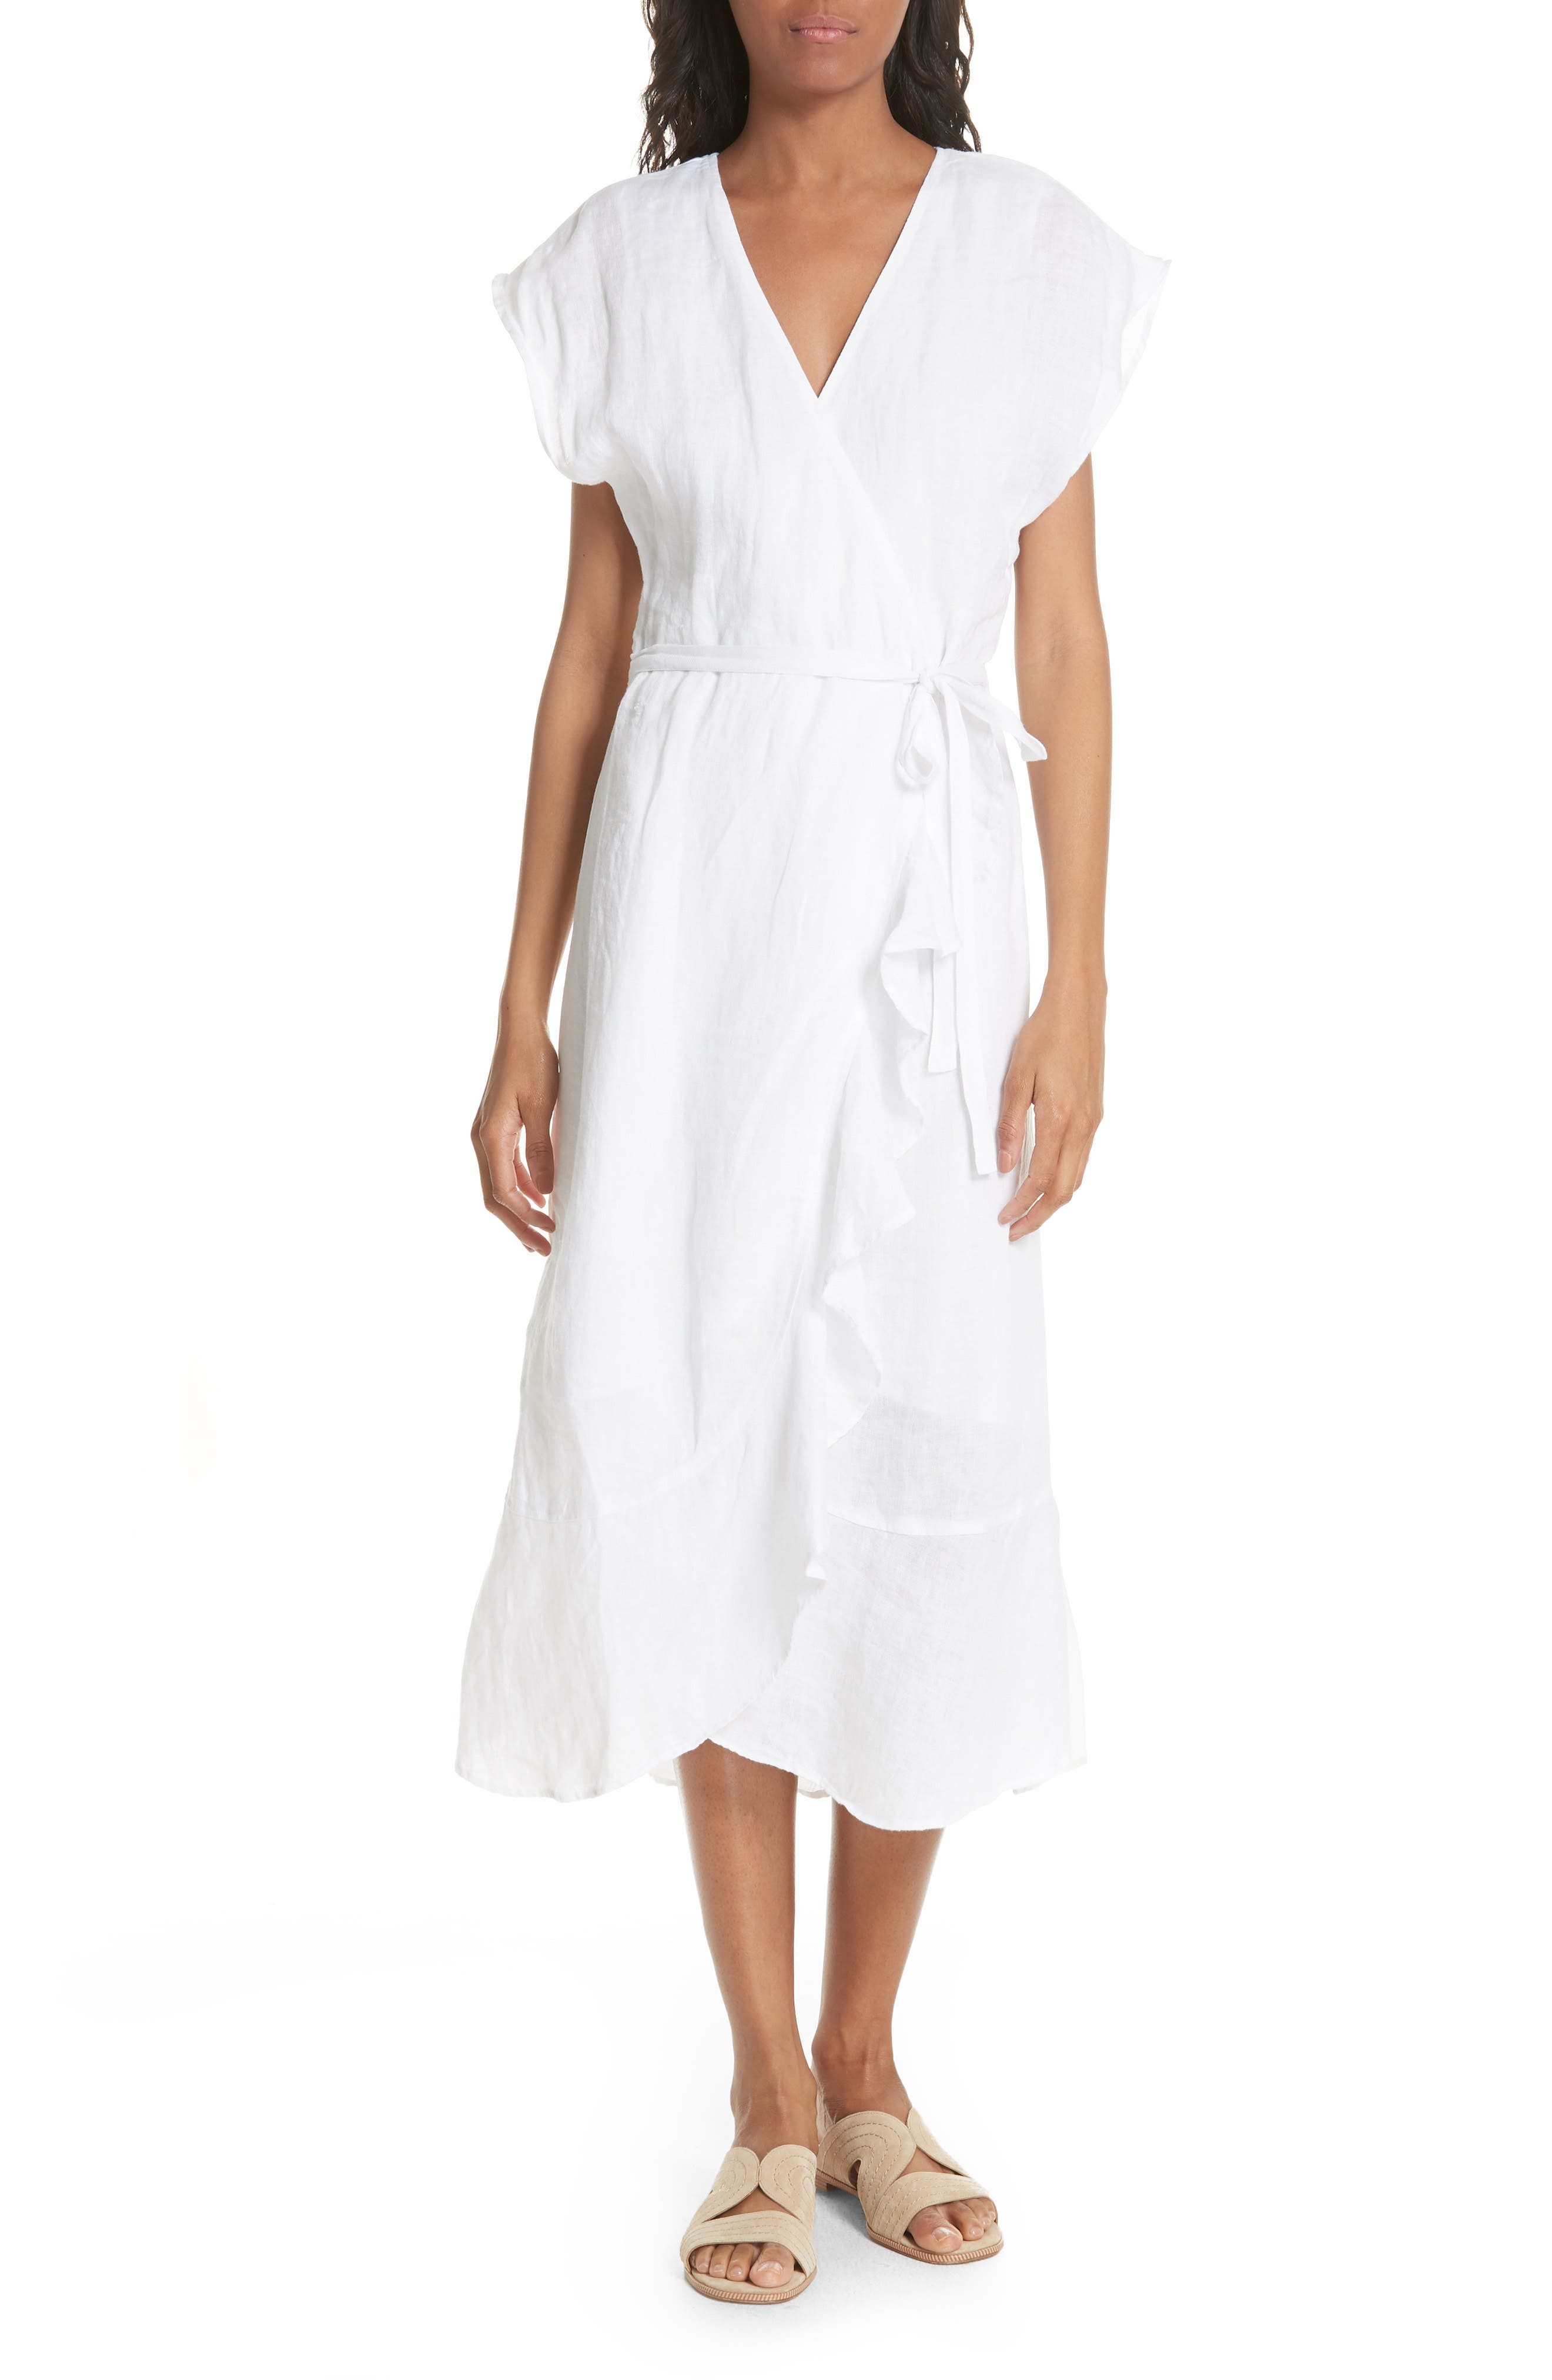 Filma Back Cutout Linen Wrap Dress,                             Main thumbnail 1, color,                             120